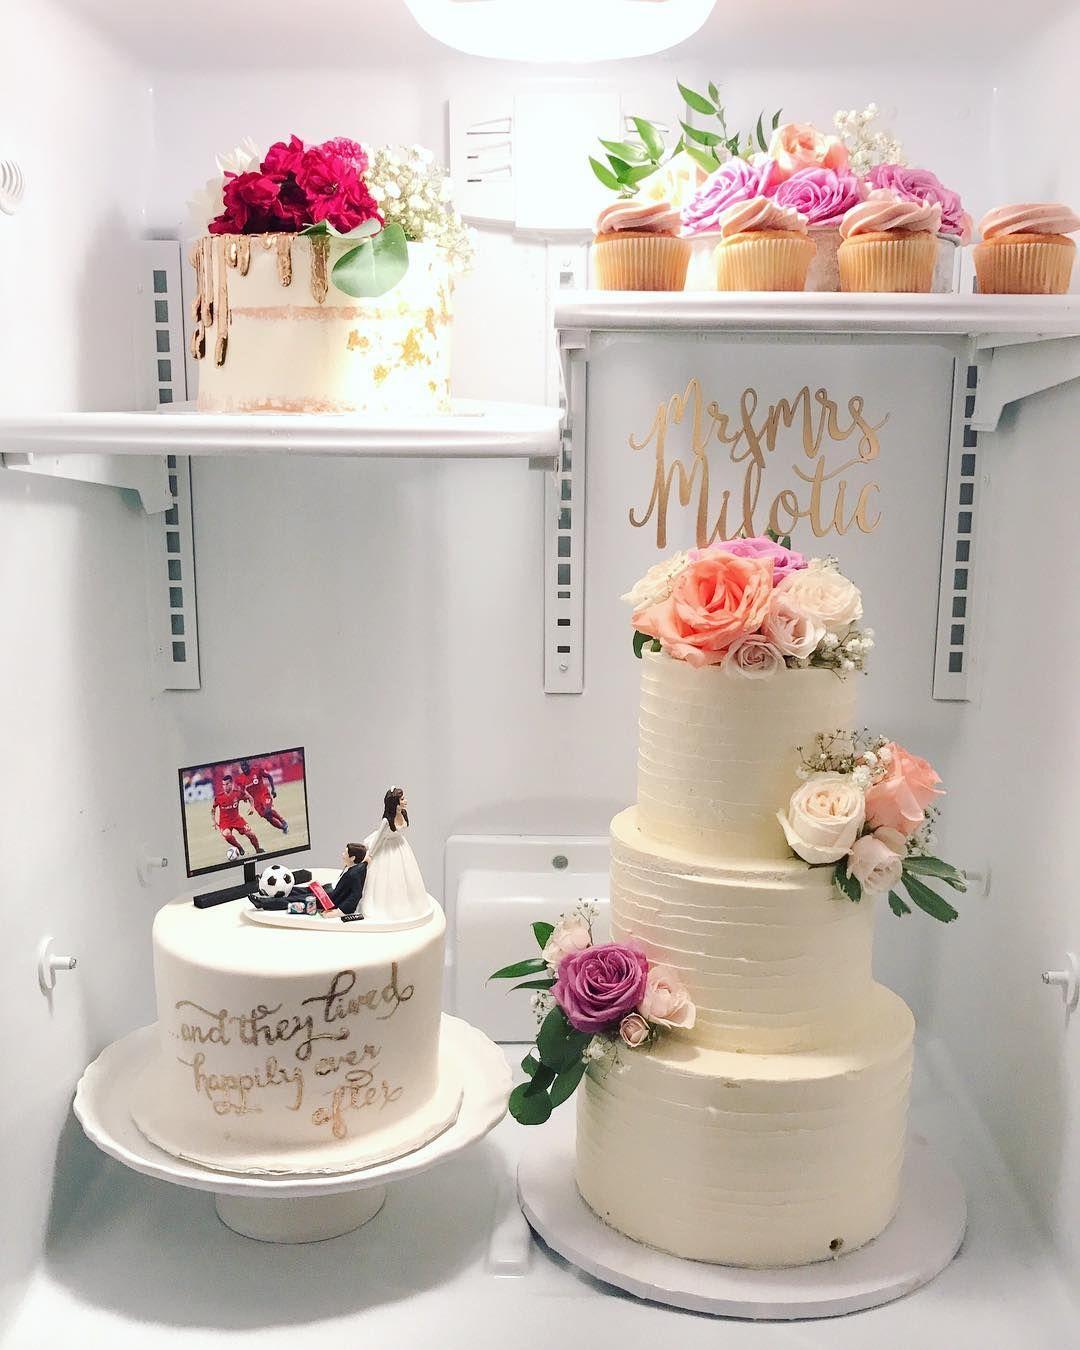 Wedding Cakes Inspired By China Patterns: Wedding Cake Fridge Situation